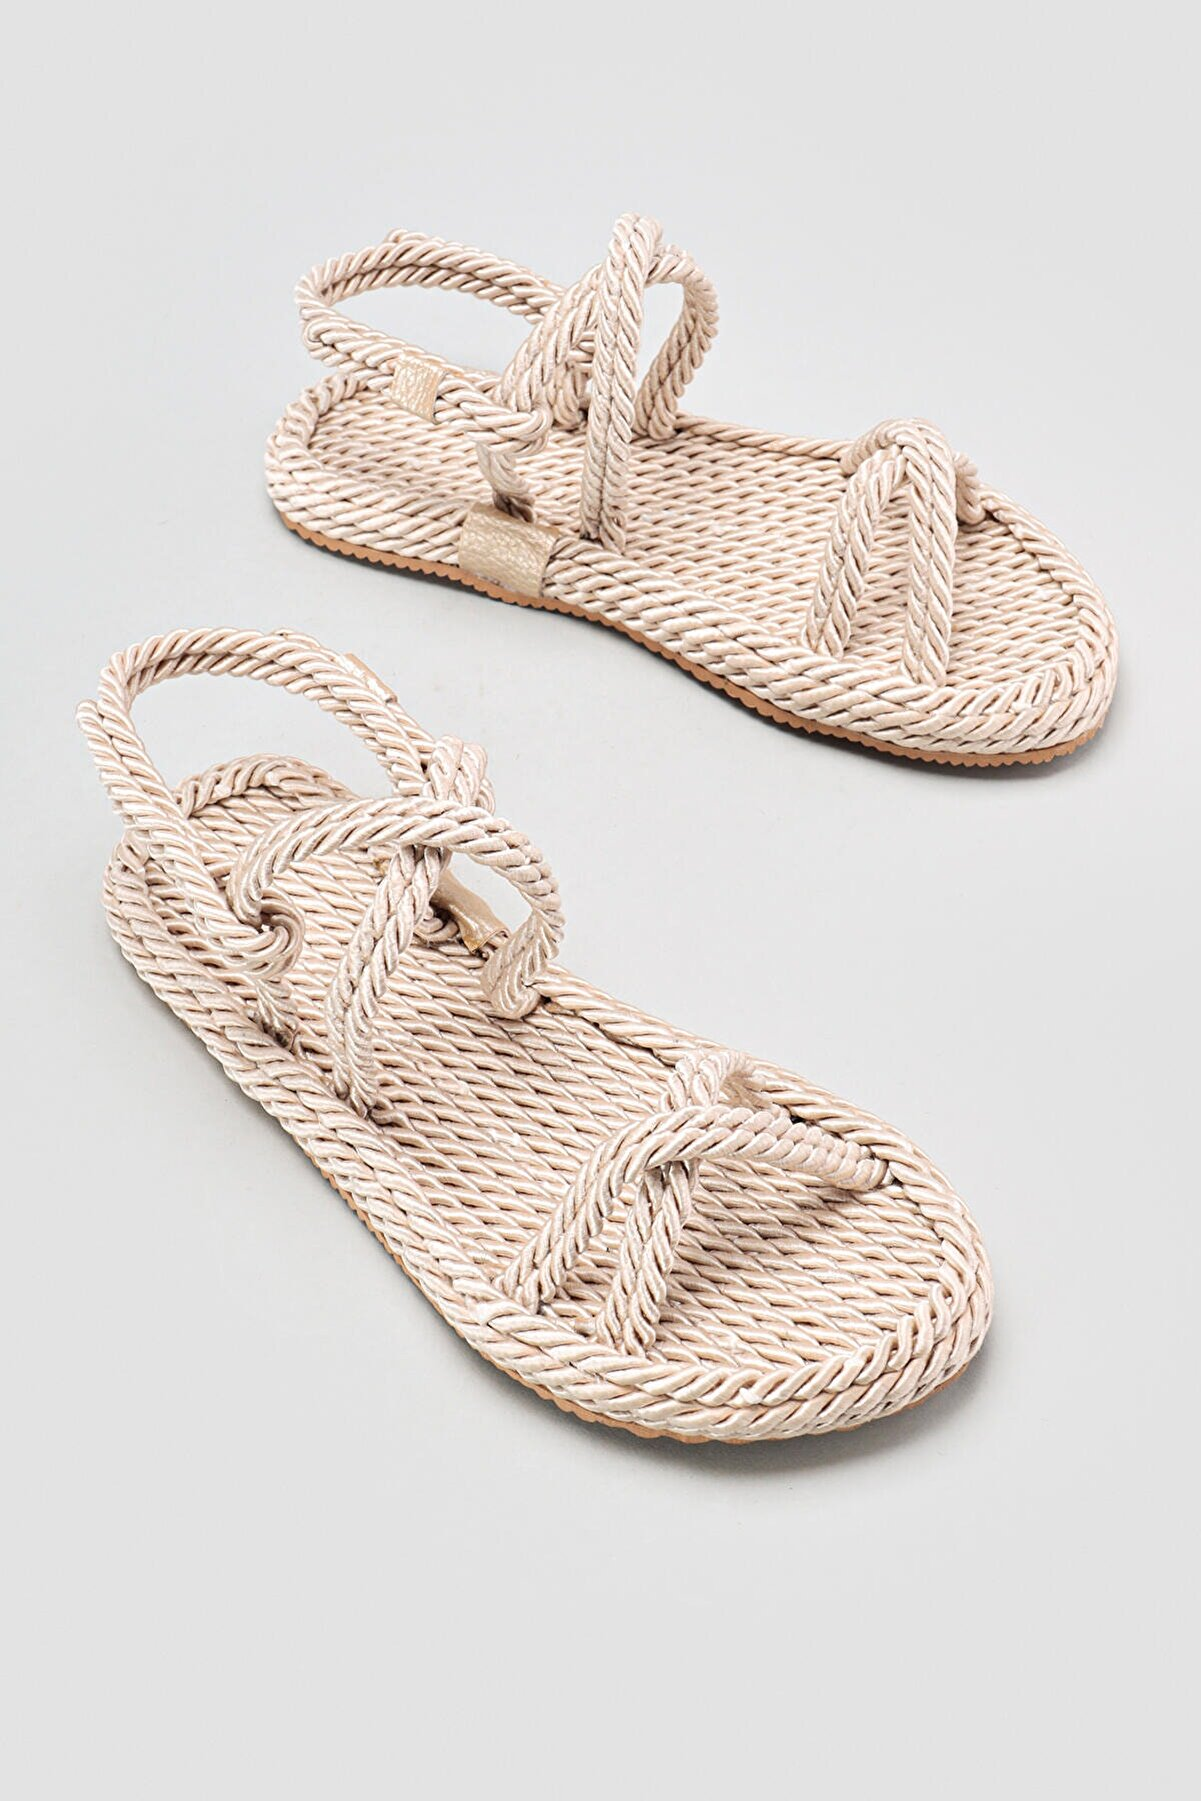 Limoya Pauletta Ten Halat Detaylı Sandalet